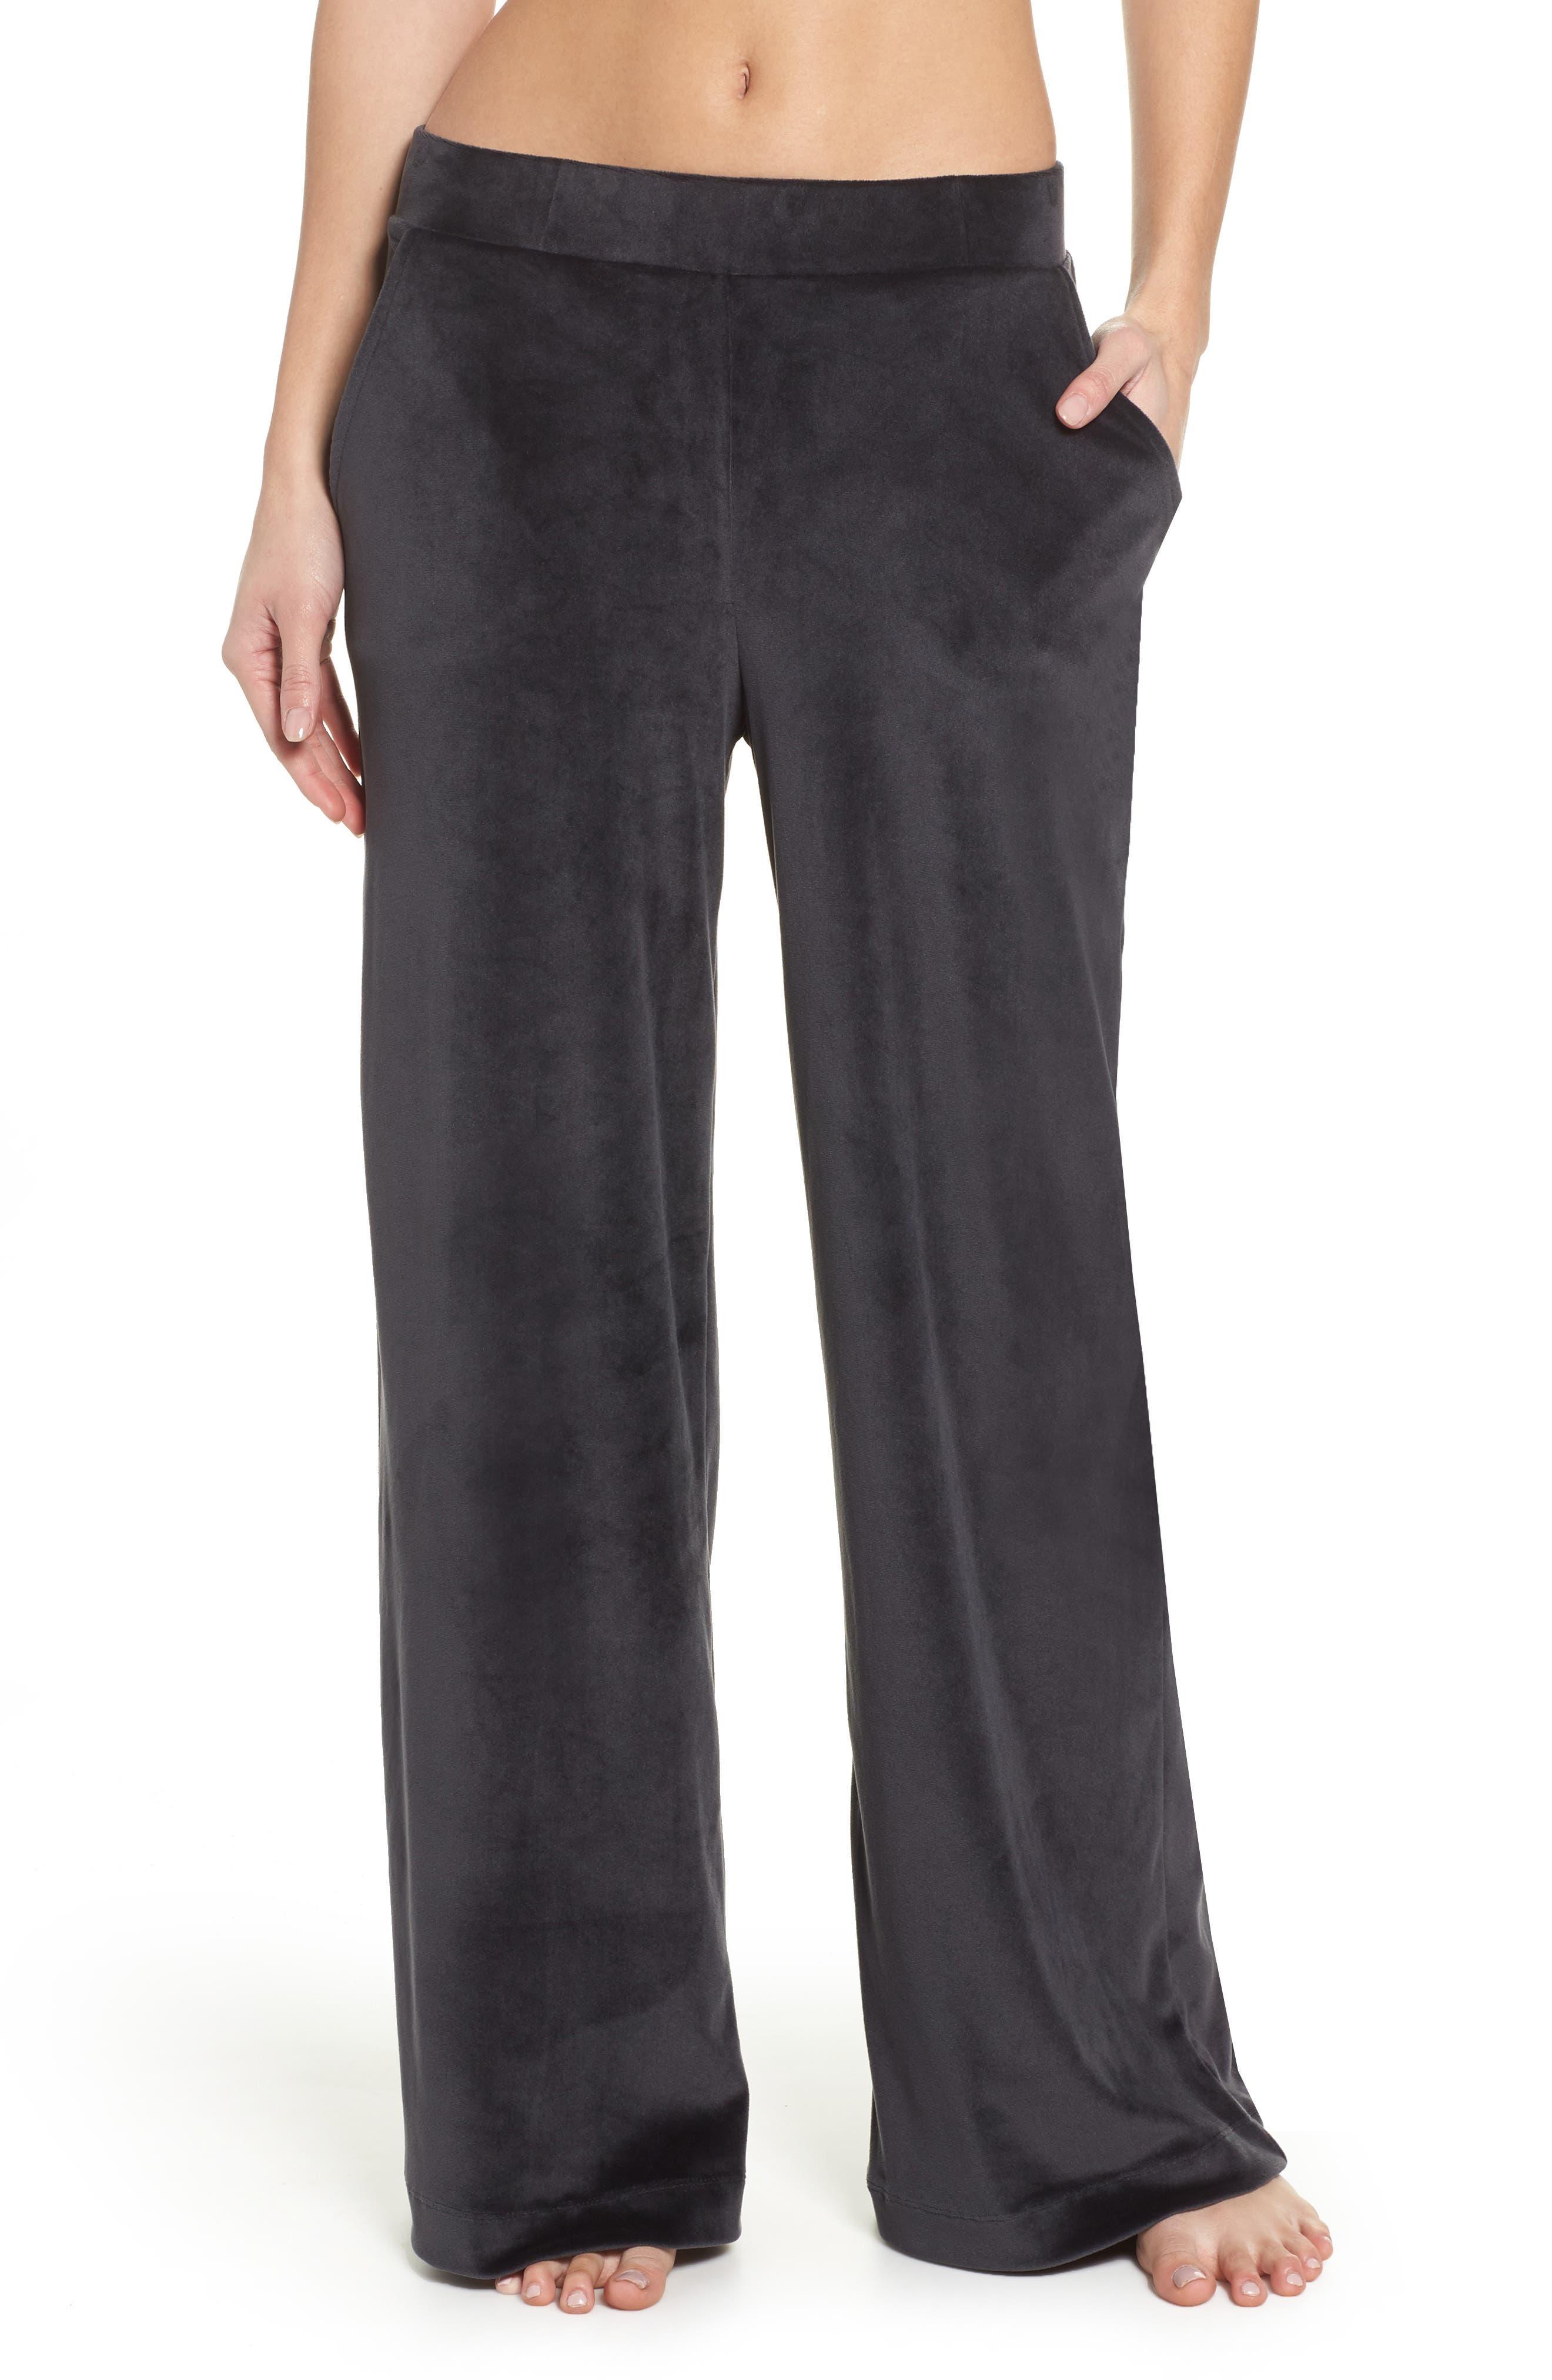 Cha Cha Spa Pants,                         Main,                         color, 001